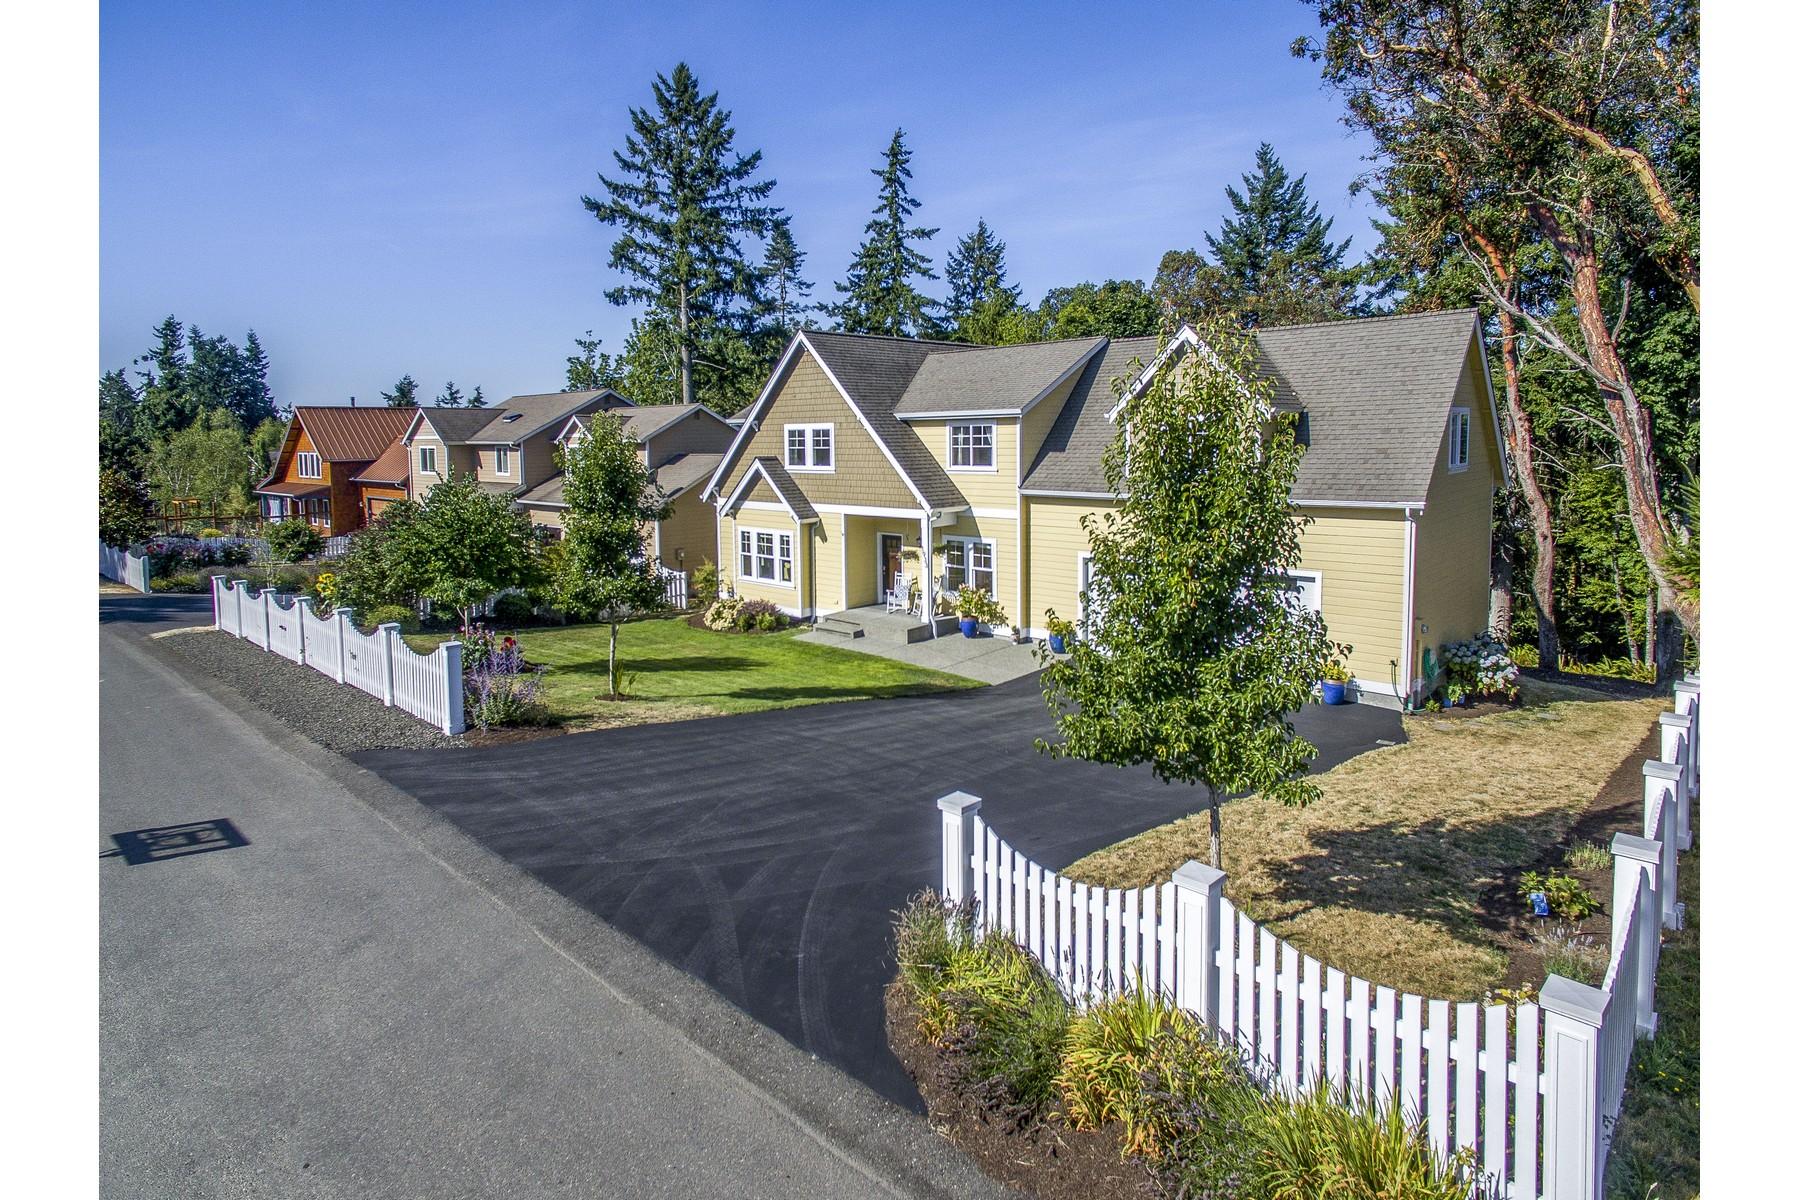 واحد منزل الأسرة للـ Sale في Sun Filled Island Home 1933 Douglas Dr NE Bainbridge Island, Washington, 98110 United States